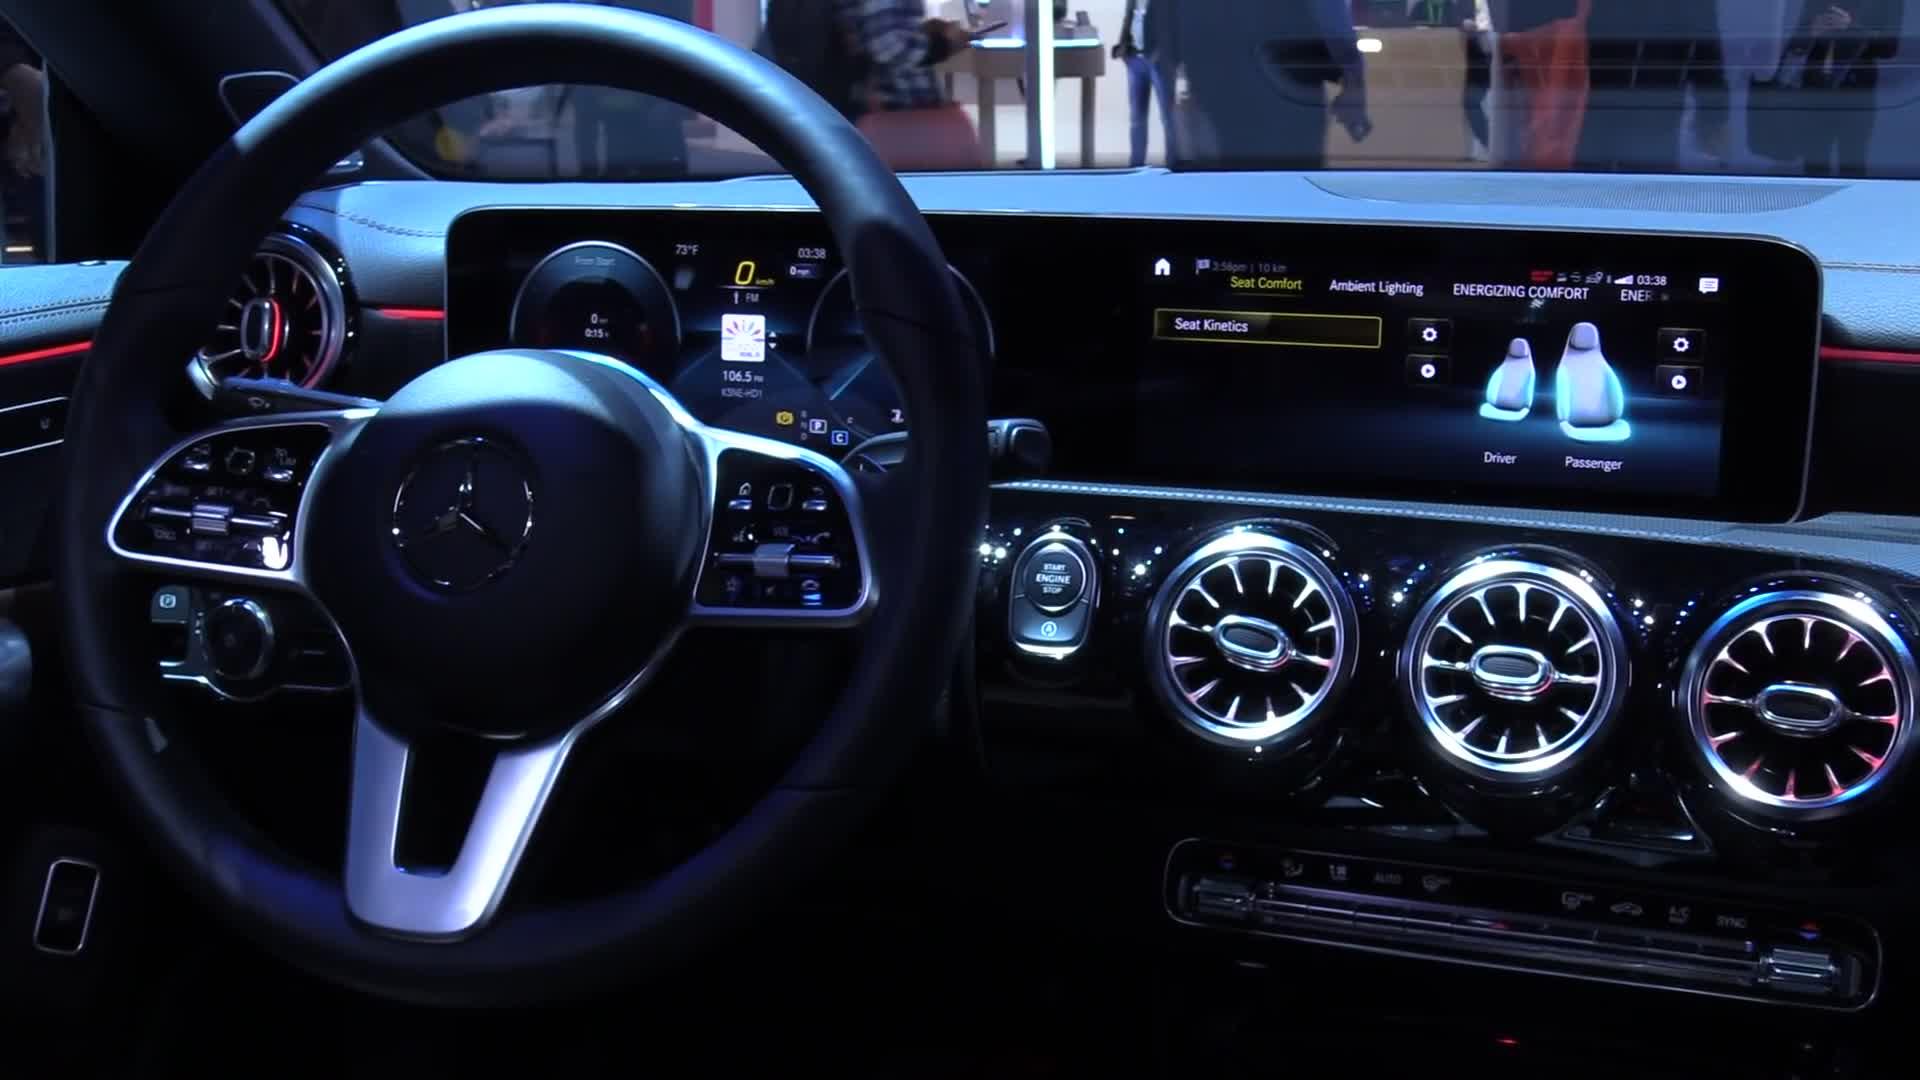 Ces, Sprachsteuerung, NewGadgets, Johannes Knapp, CES 2019, Mercedes Benz, Gestensteuerung, Mercedes, Infotainment, Gestenerkennung, Mercedes-Benz, MBUX, CLA 2019, Mercedes CLA 2019